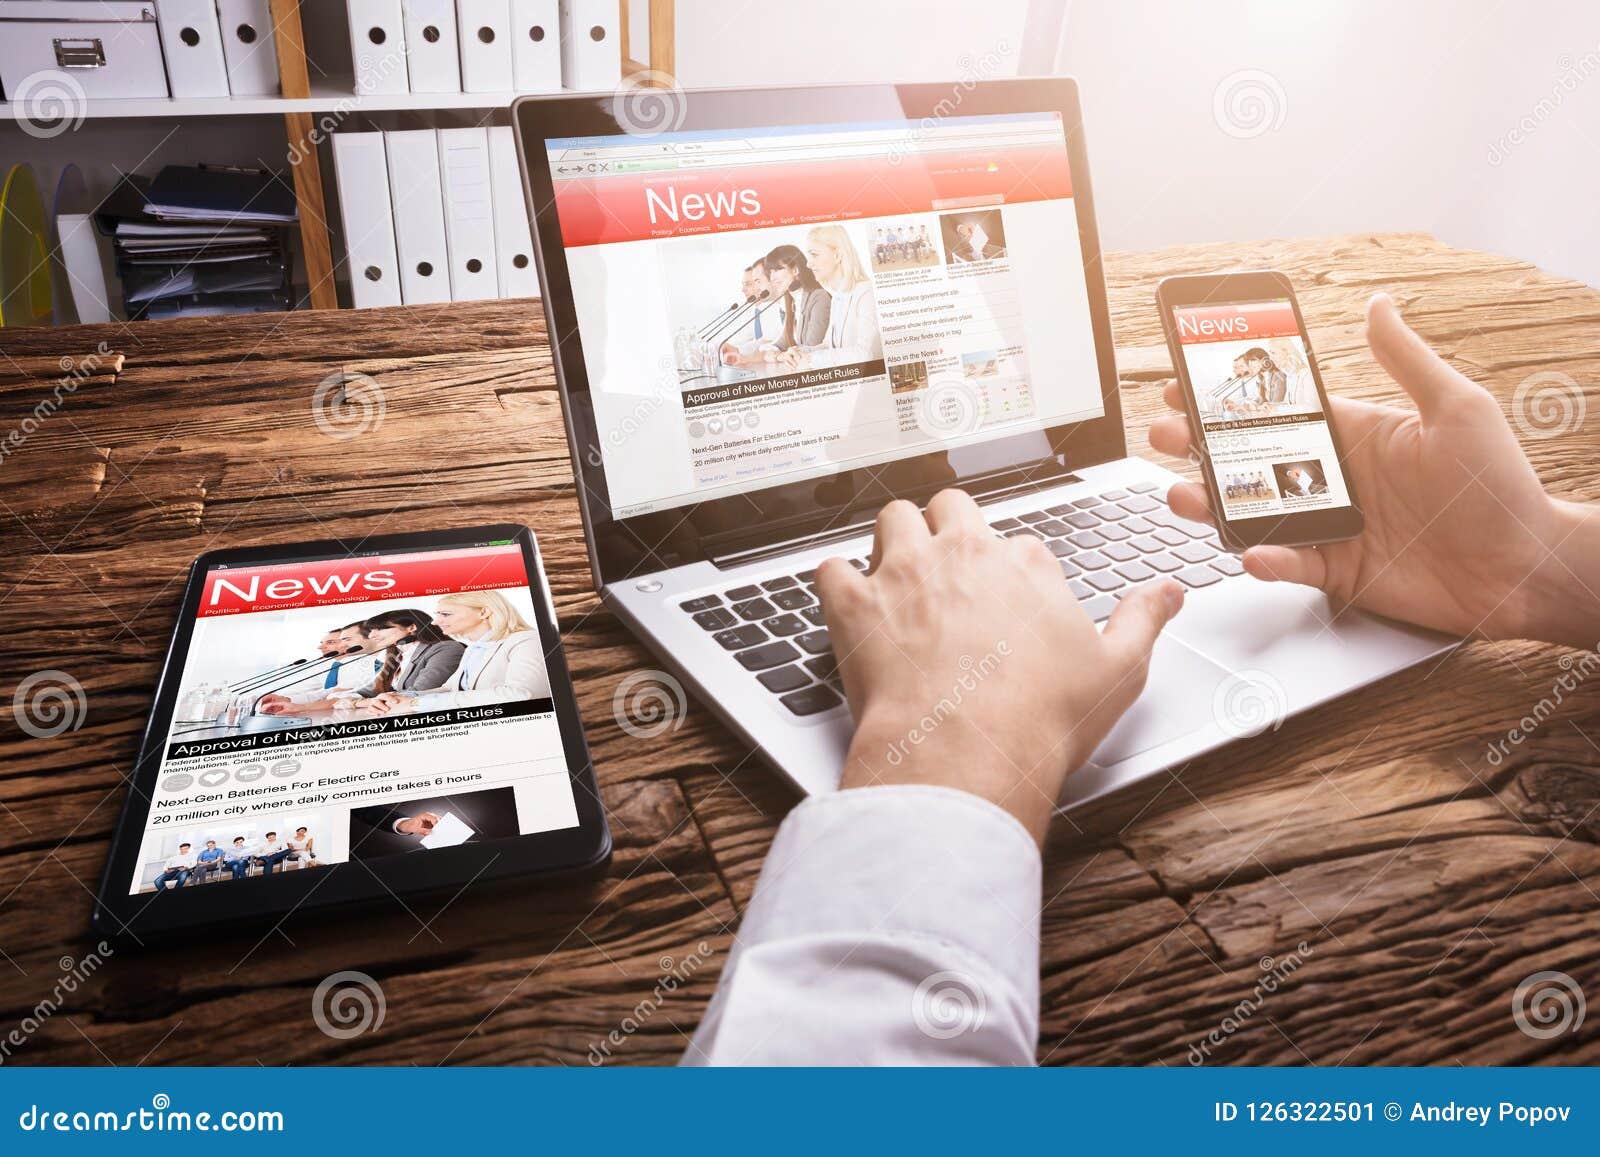 Работа онлайн читая новости академия форекса на ютубе